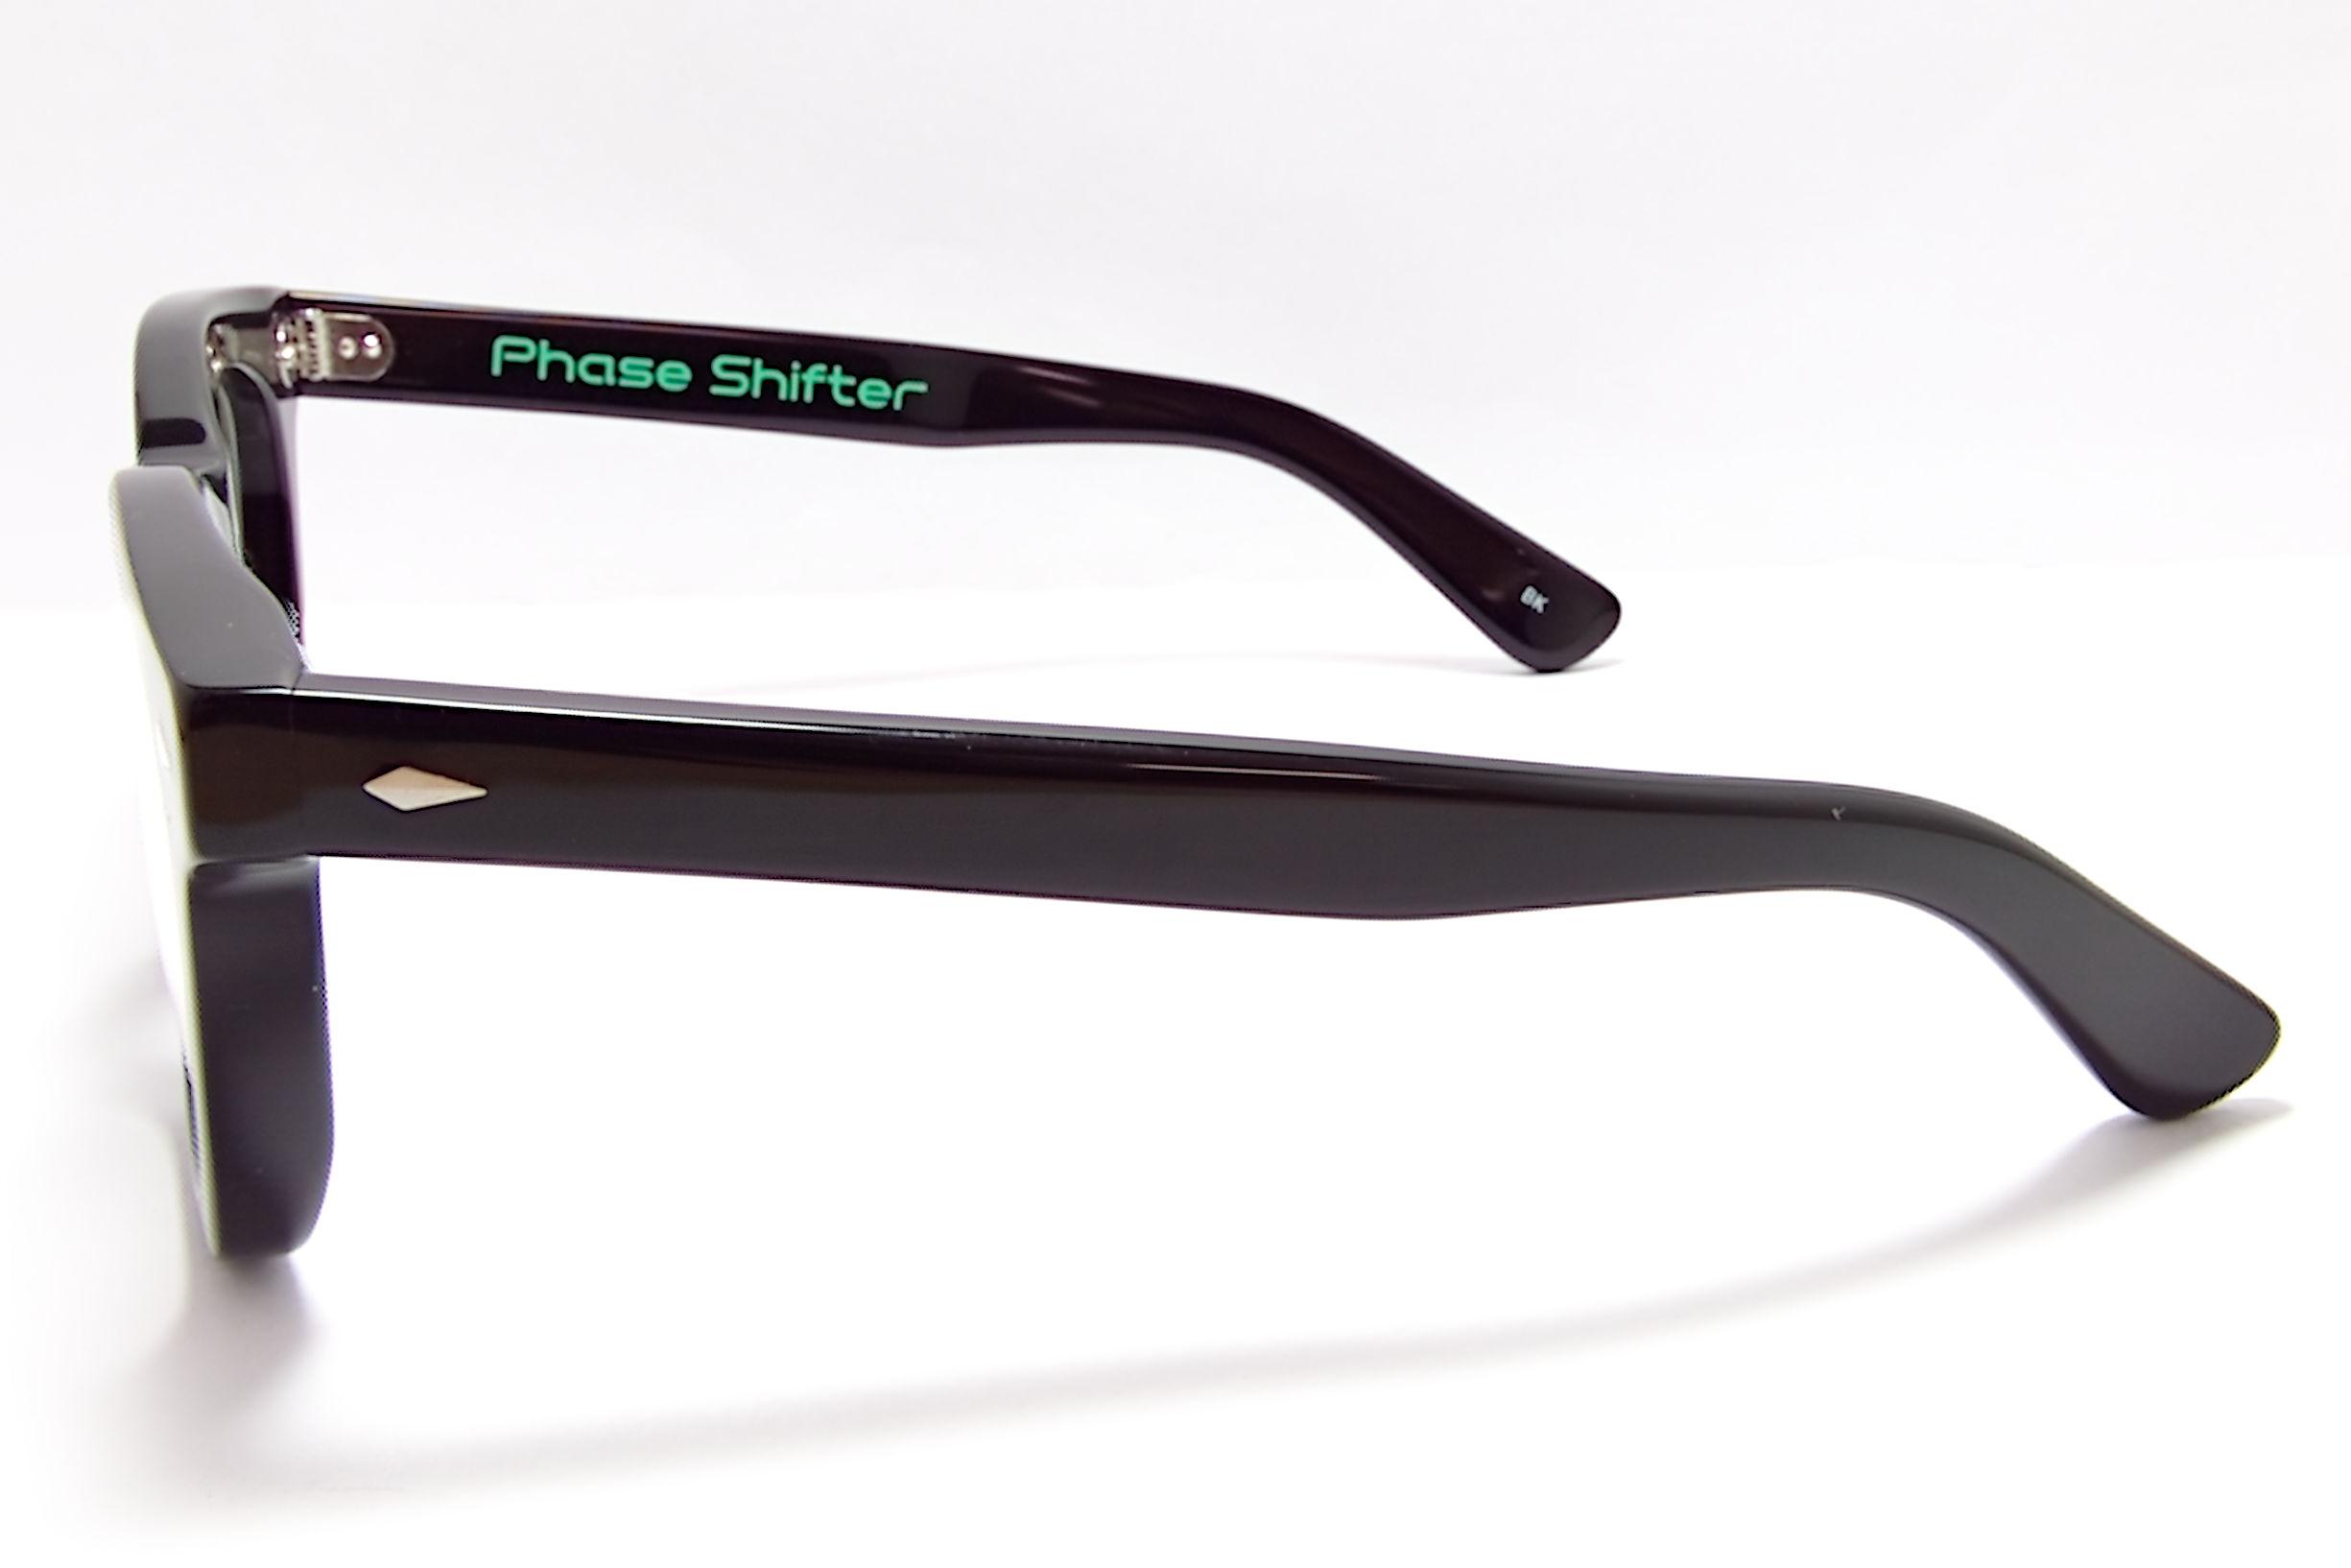 Phase Shifter BK